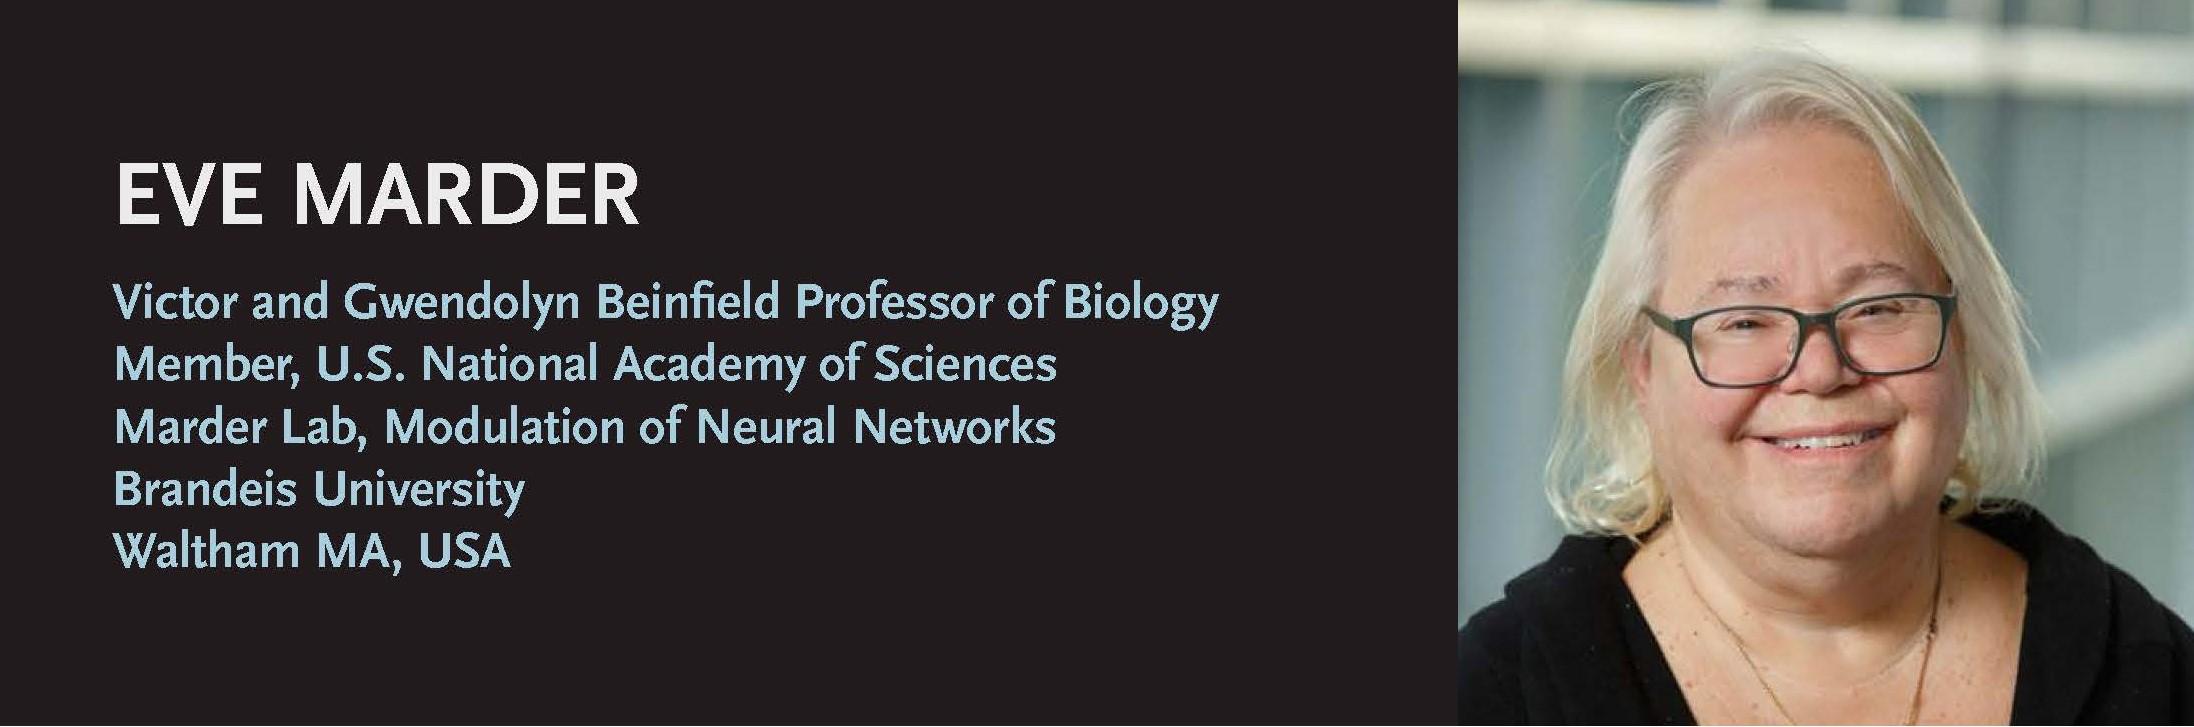 https://www.sfb1315.de/wp-content/uploads/2021/01/SFB-lecture-series-Marder-.jpg